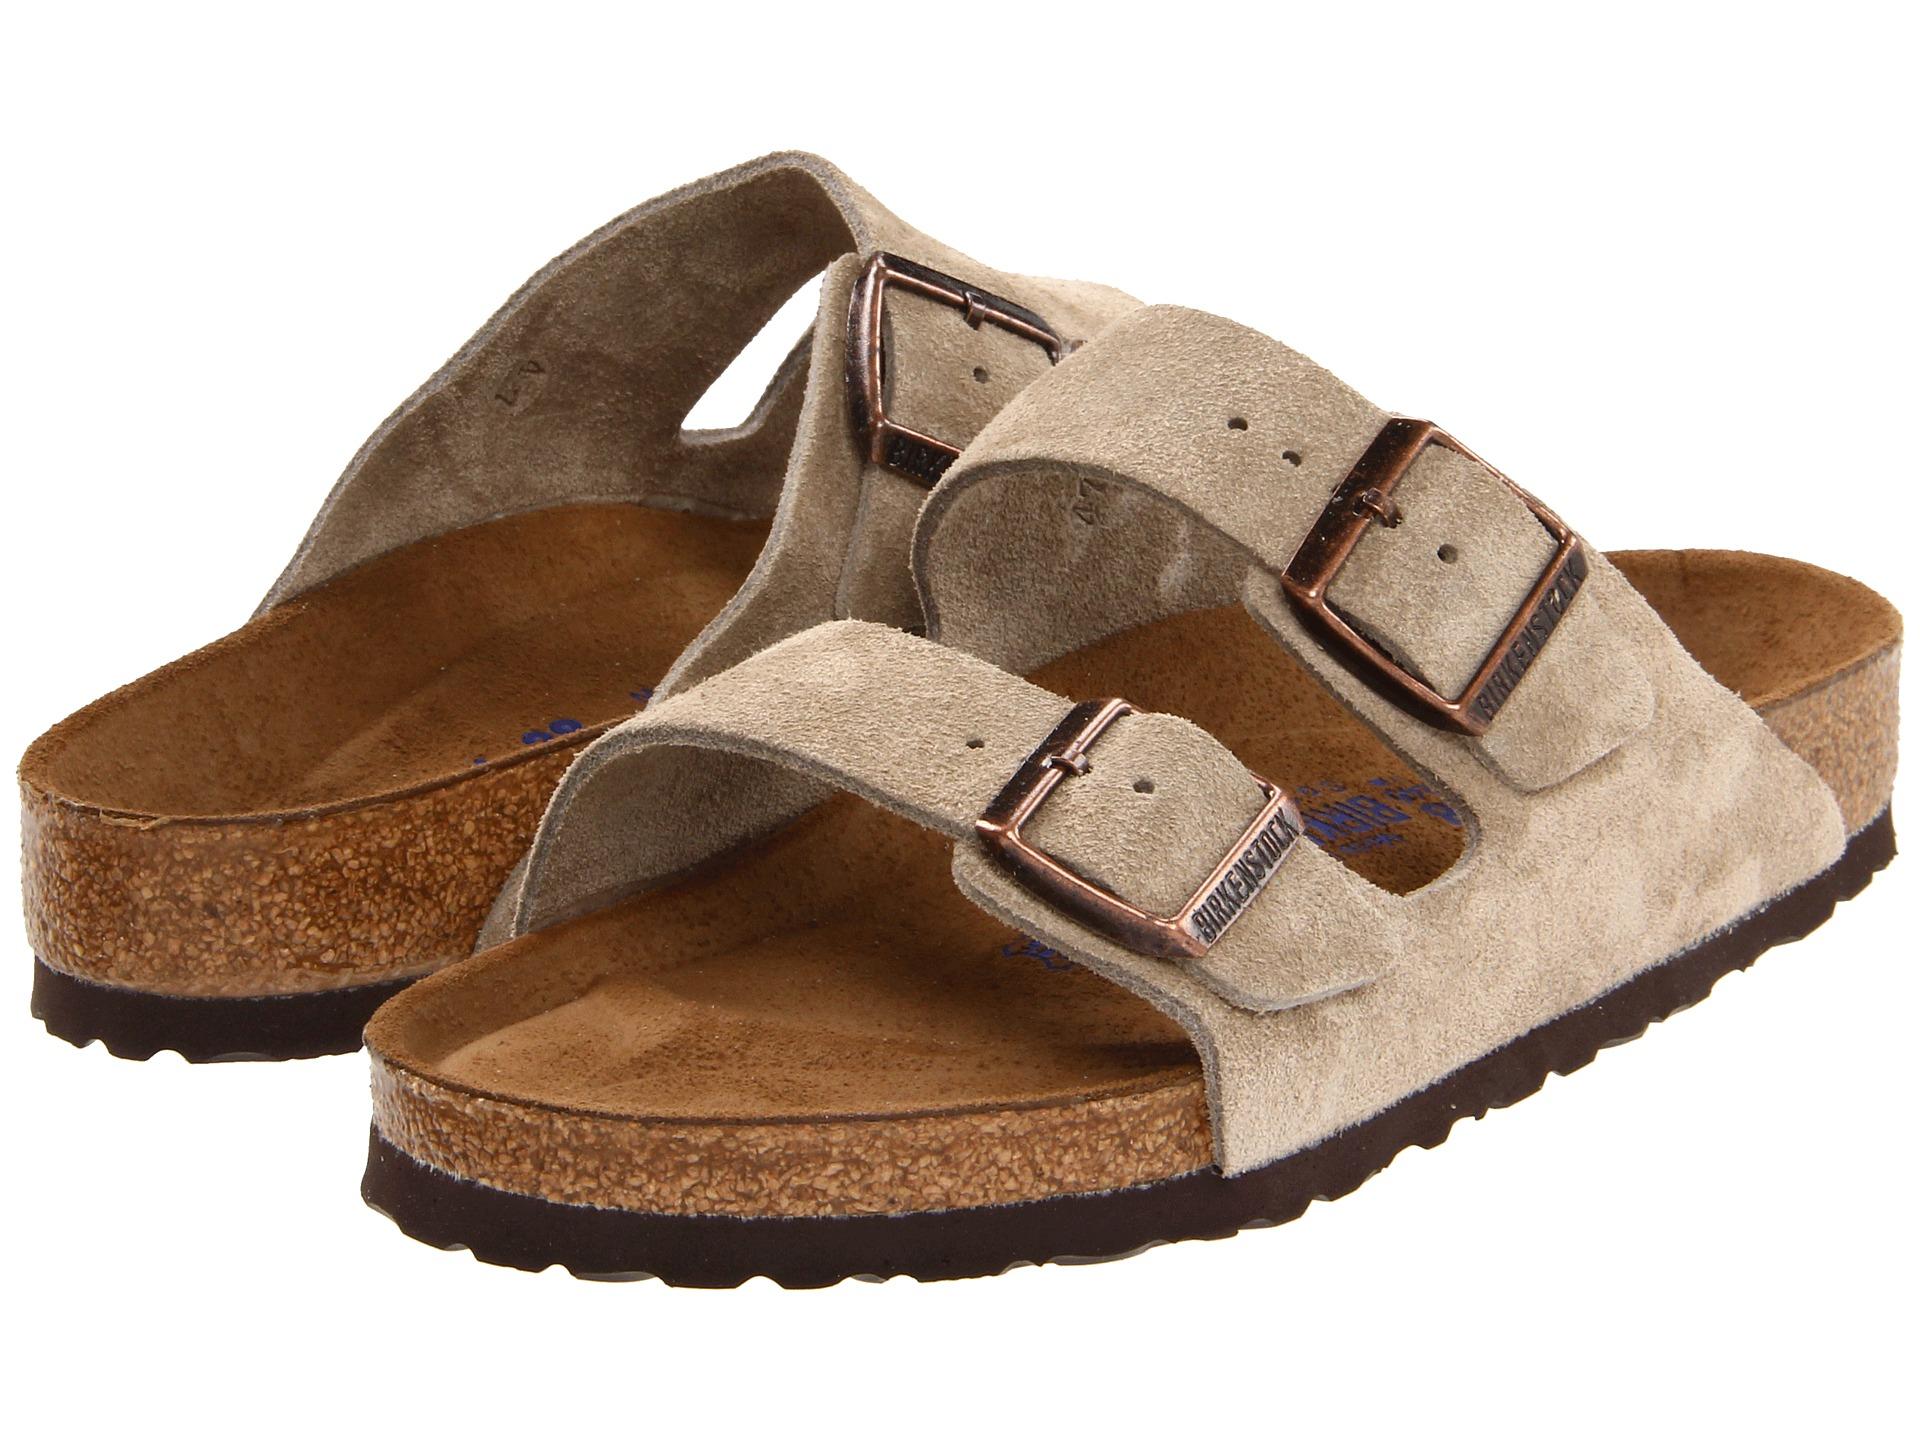 Birkenstock Arizona Soft Footbed Suede Unisex At